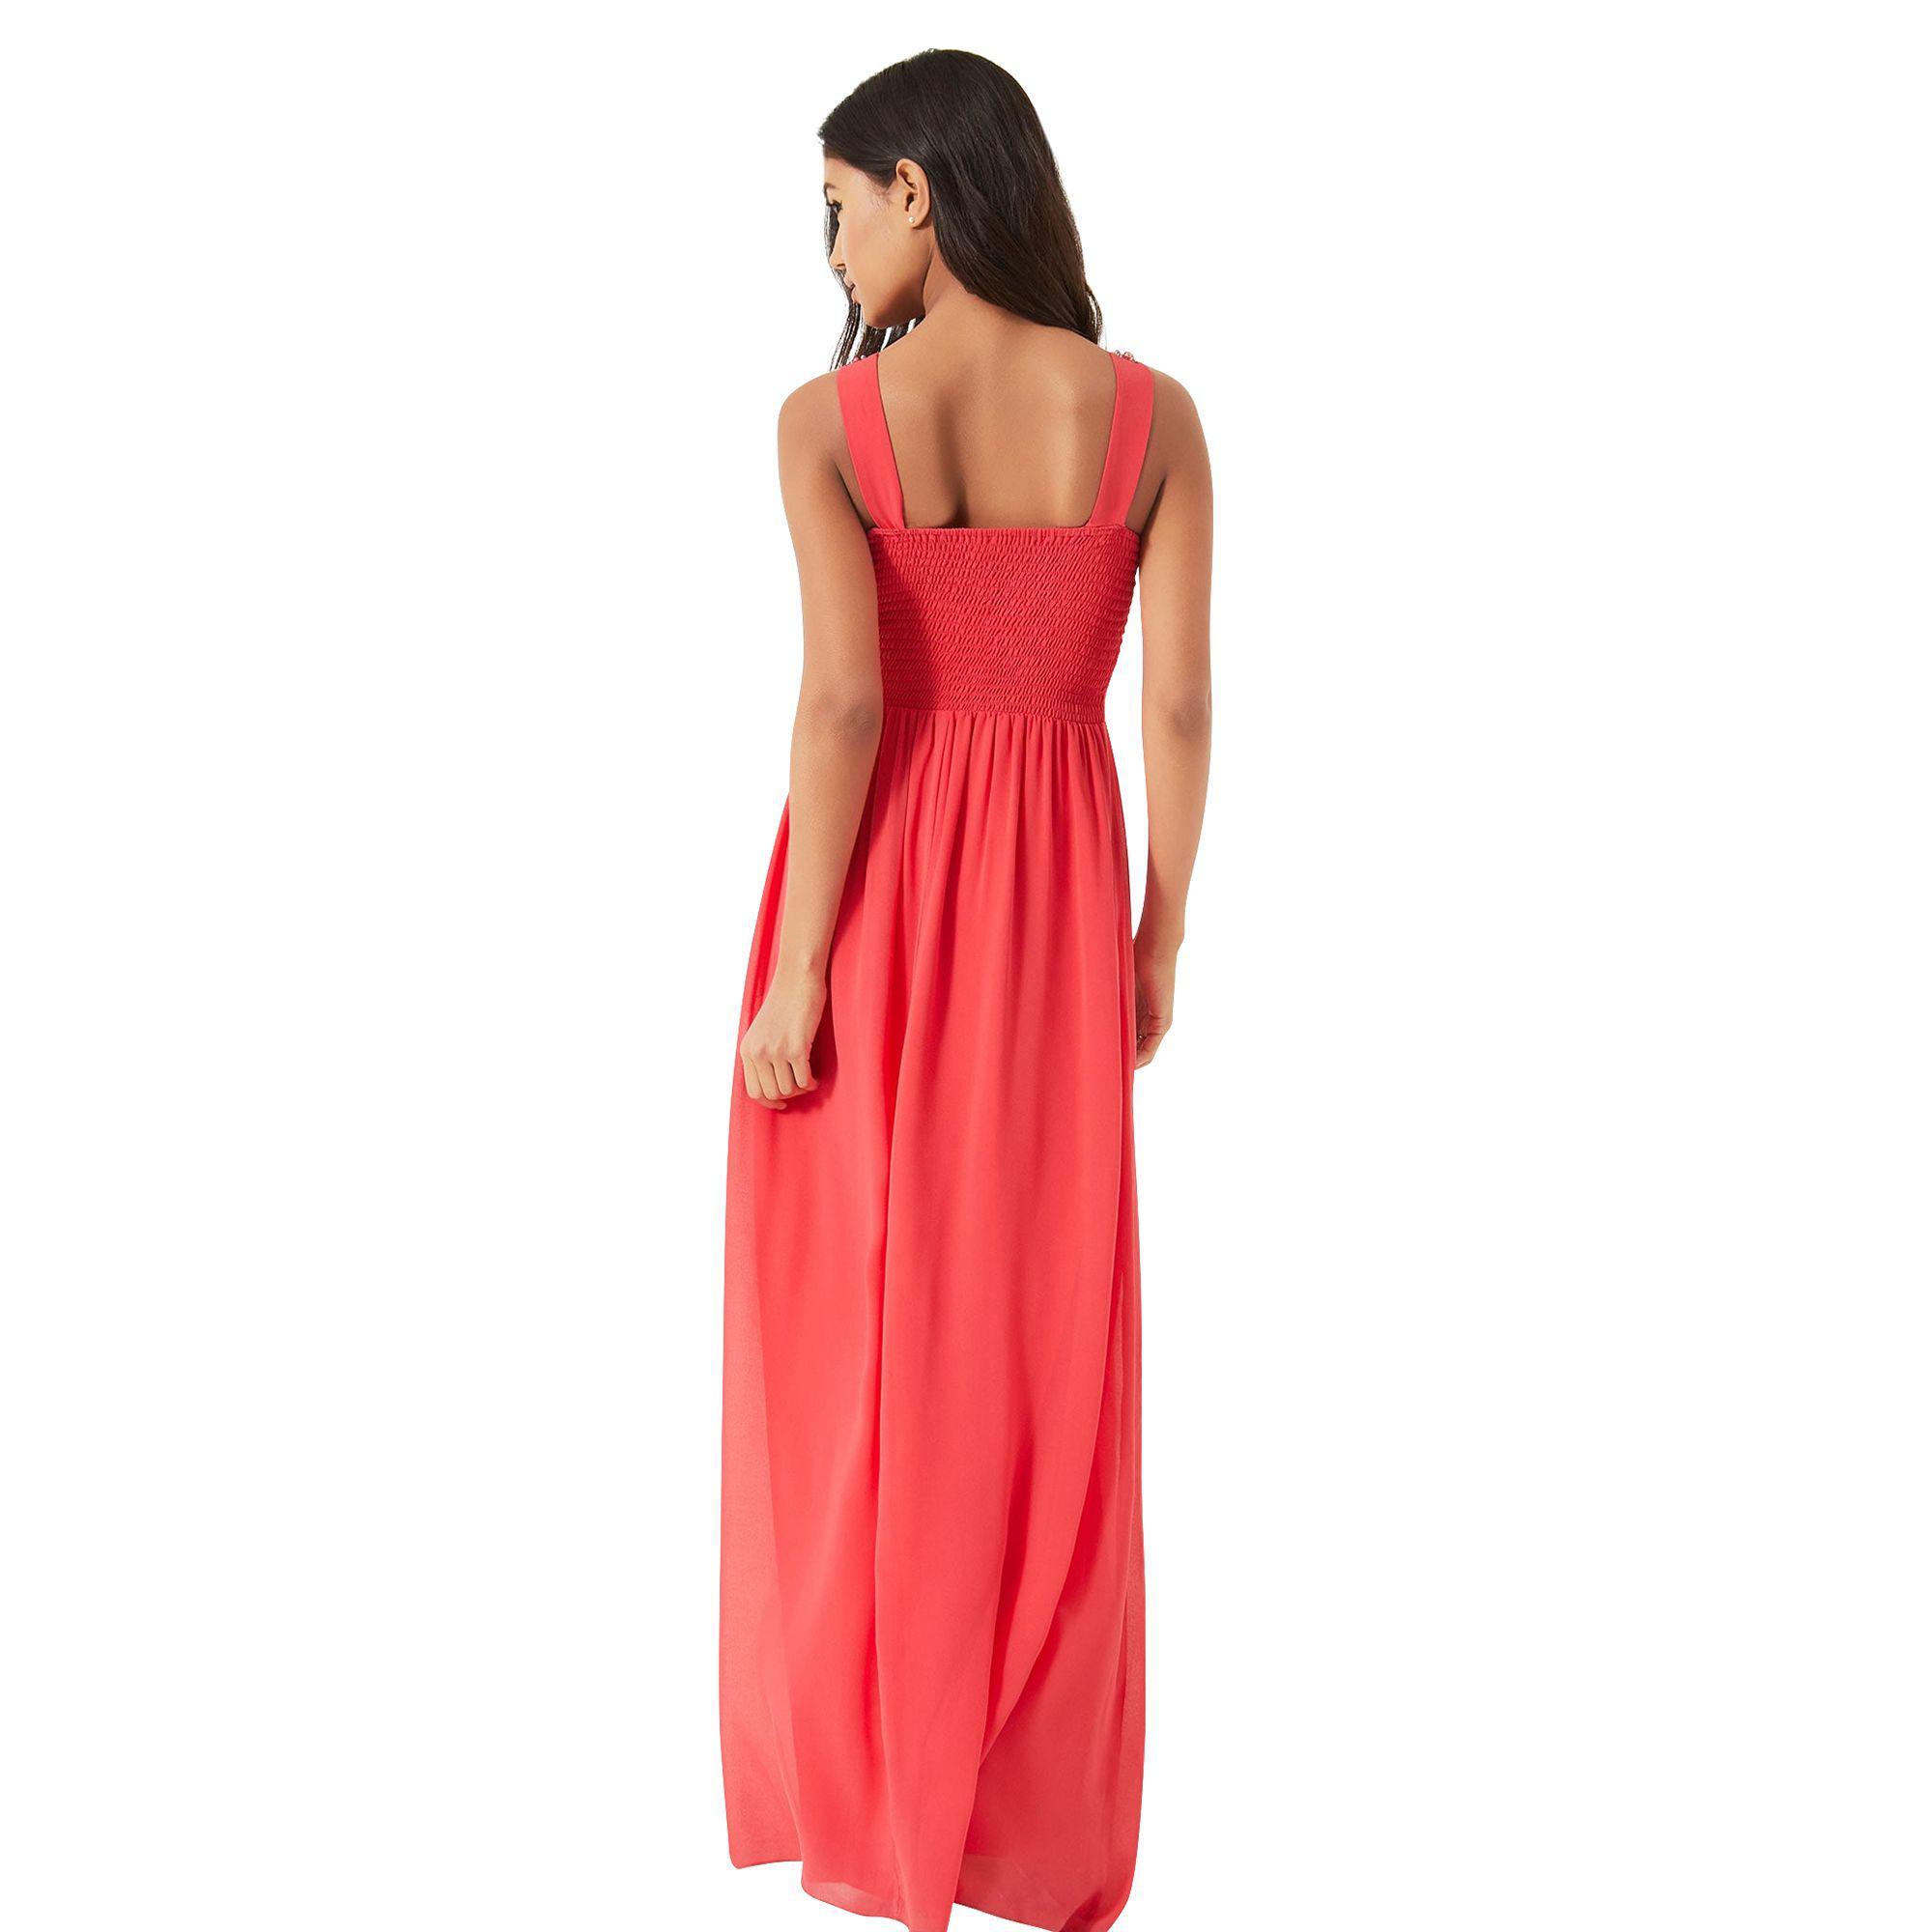 9c9c30188d Little Mistress Coral Embellished Maxi Dress in Orange - Lyst